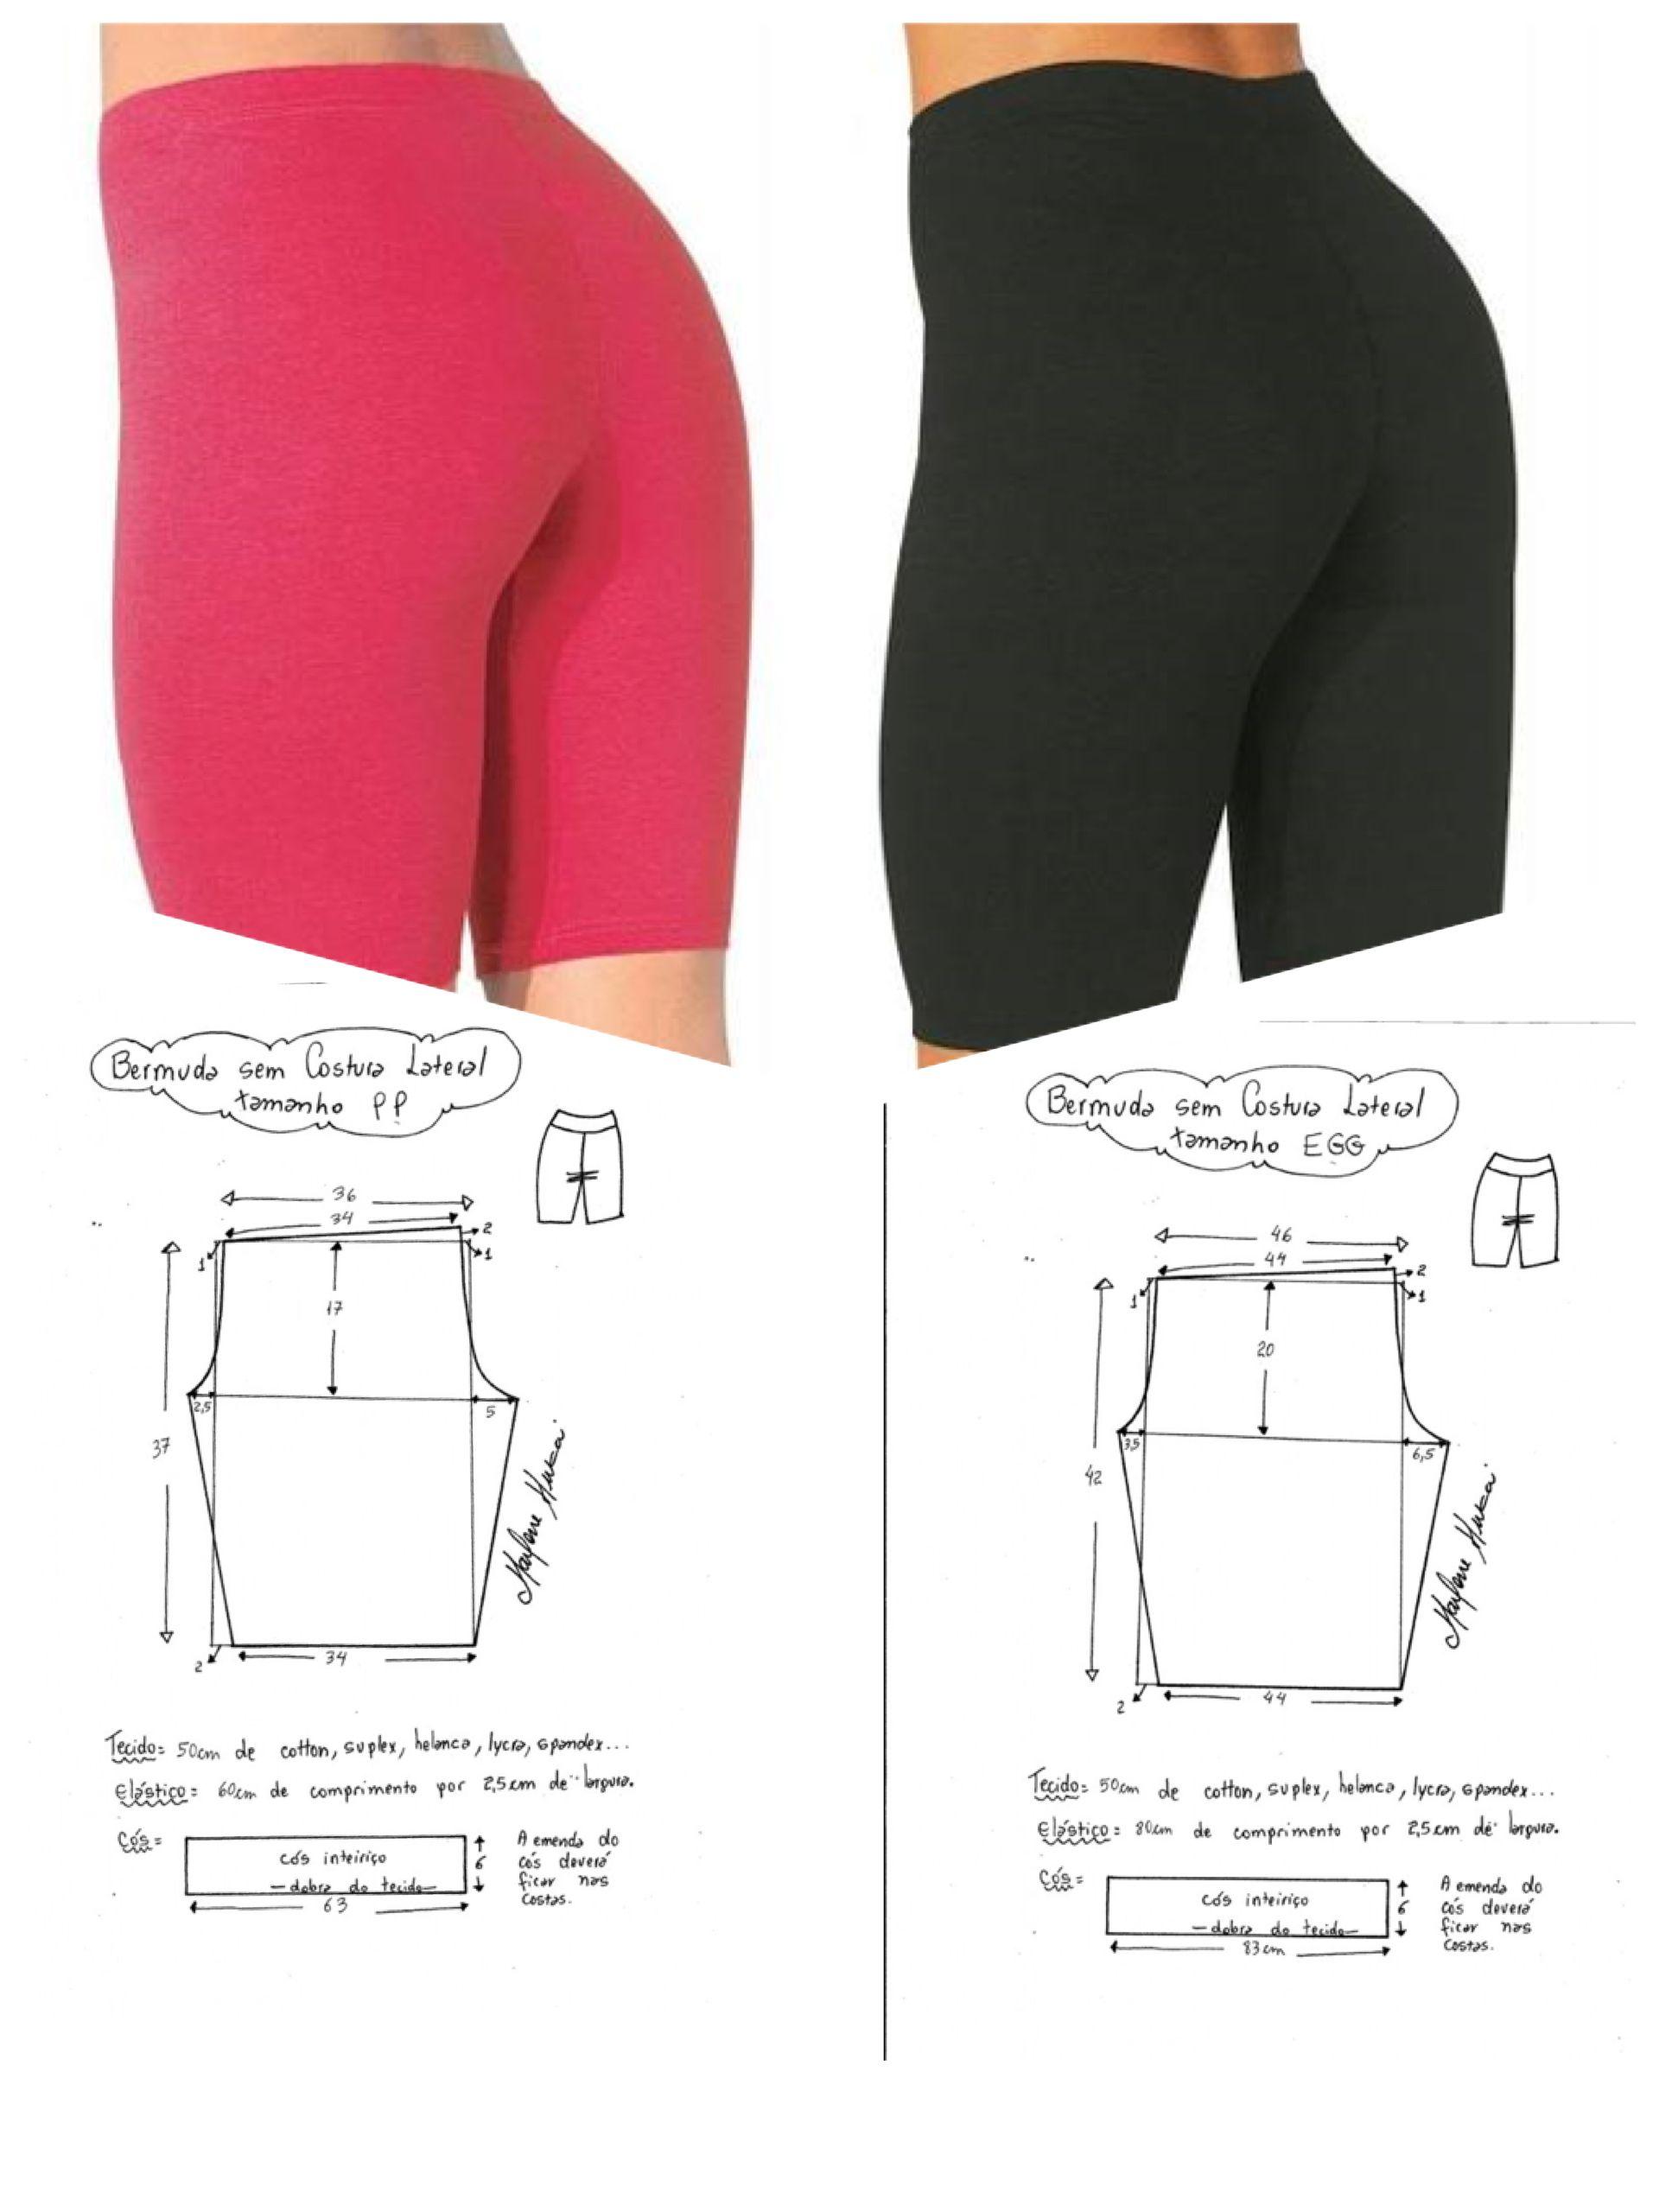 Pin de Mery Ramirez Galarza en lenceria | Pinterest | Sewing pants ...